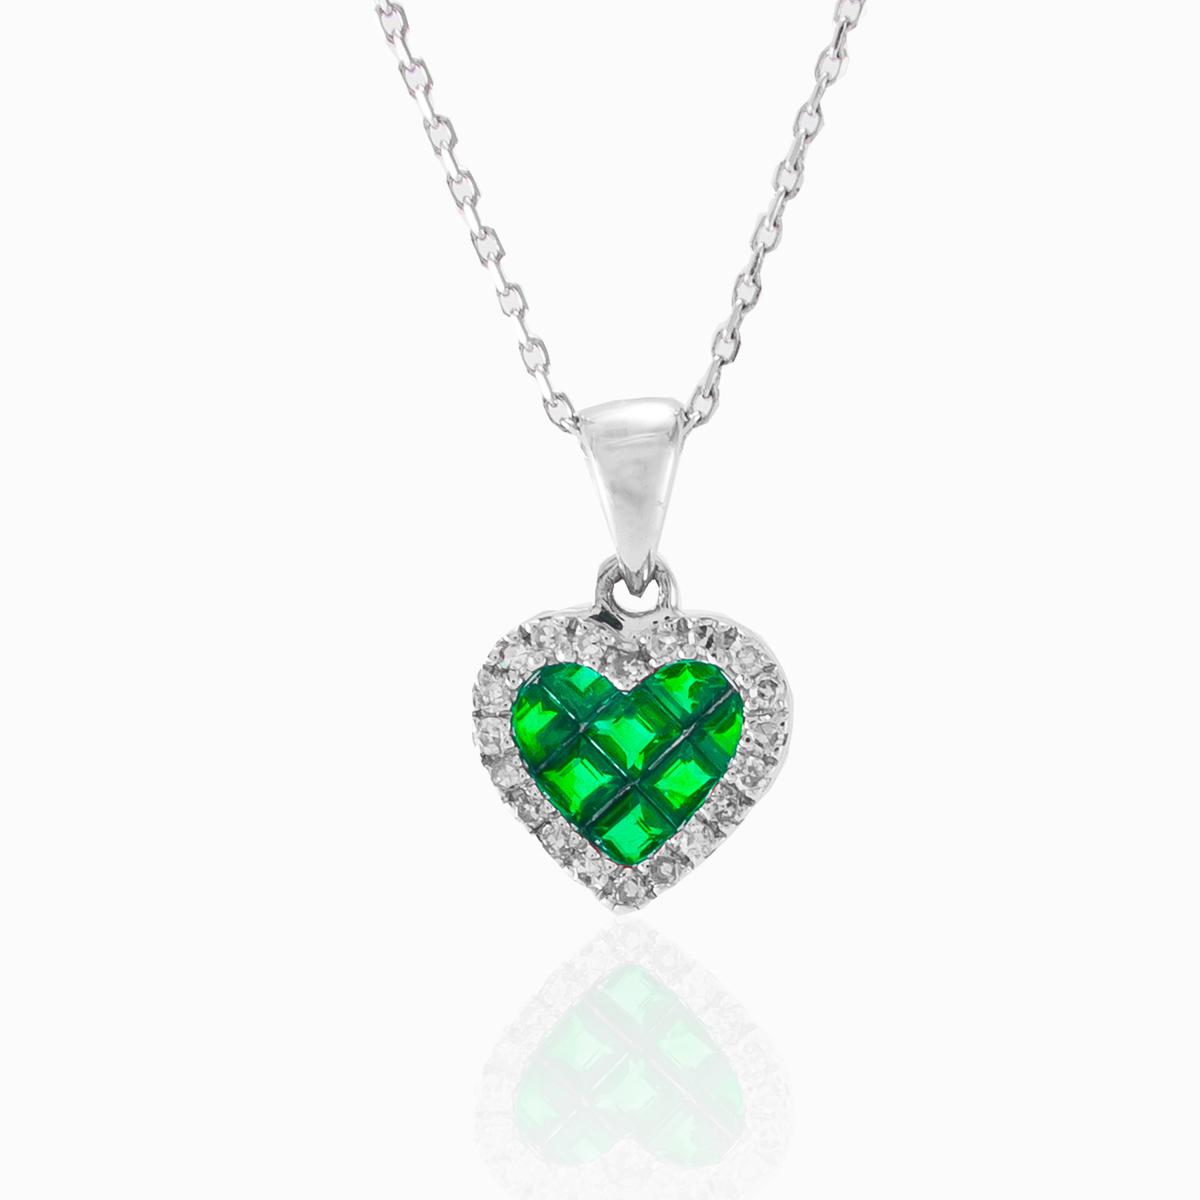 White gold pendant with diamonds and emeralds monte cristo emerald heart pendant aloadofball Images